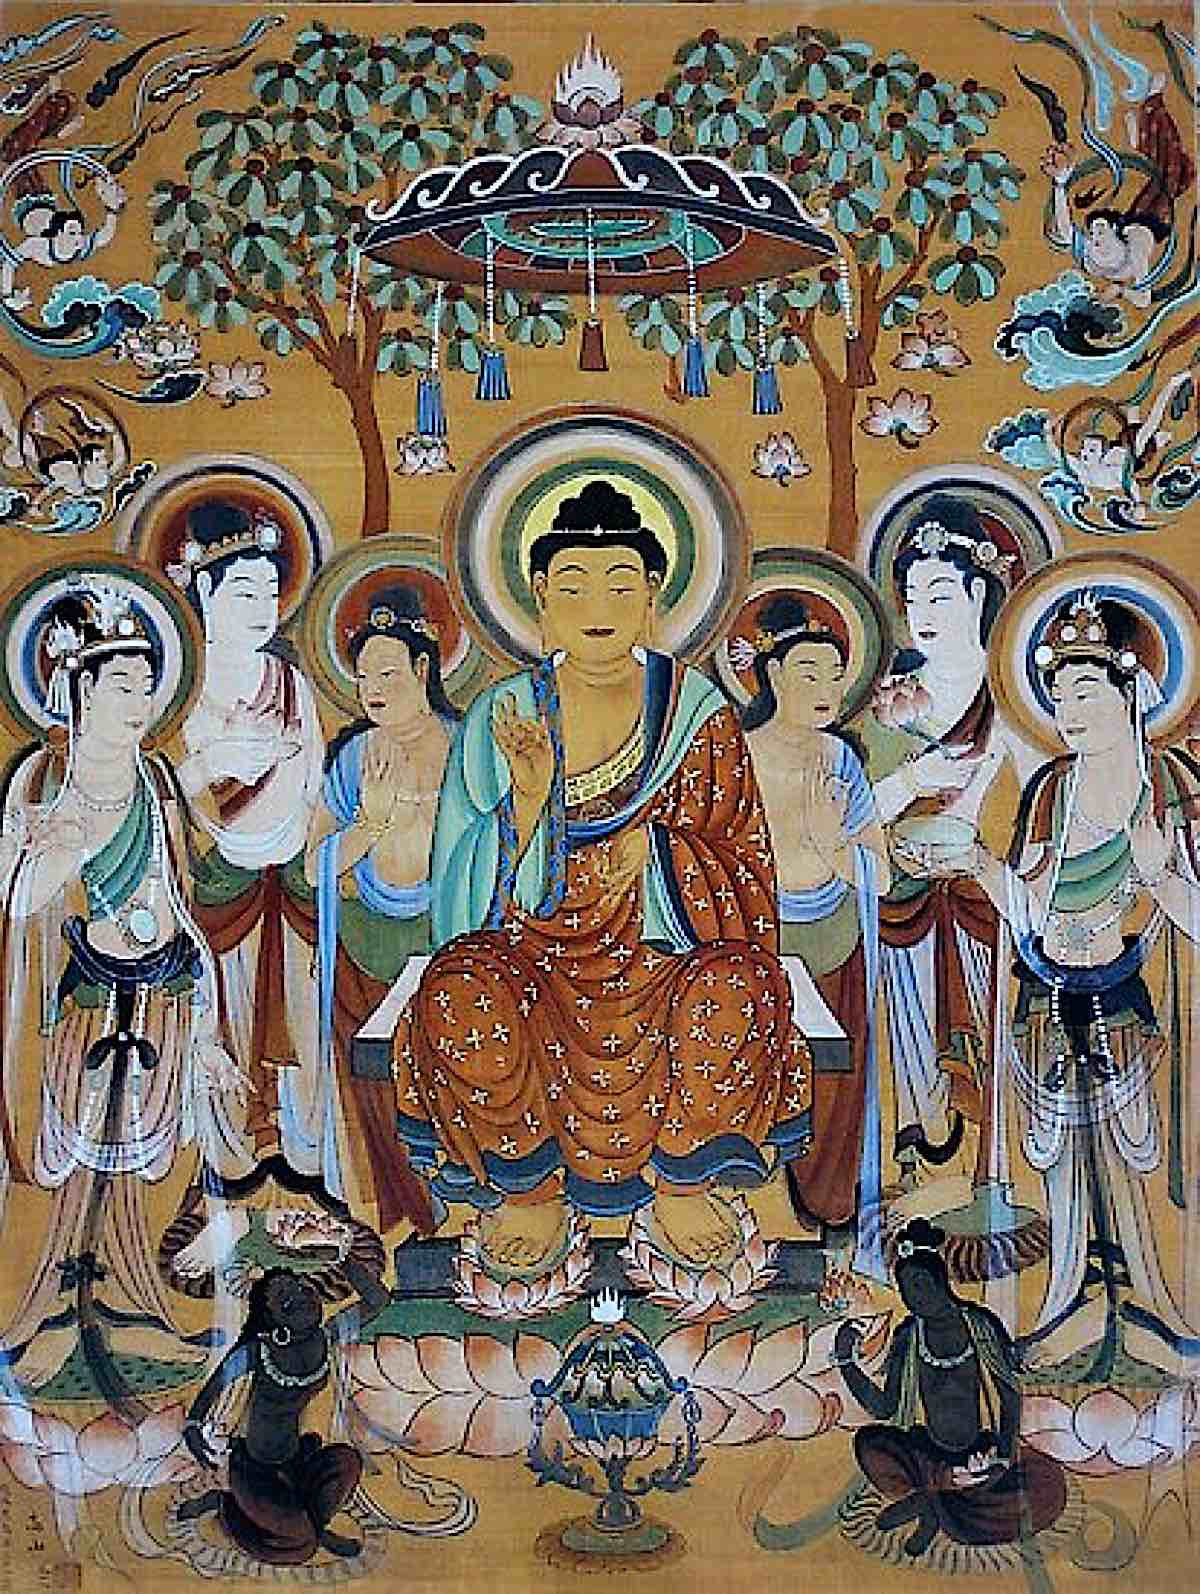 Buddha Weekly Group of Bodhisattvas and Buddha Buddhism